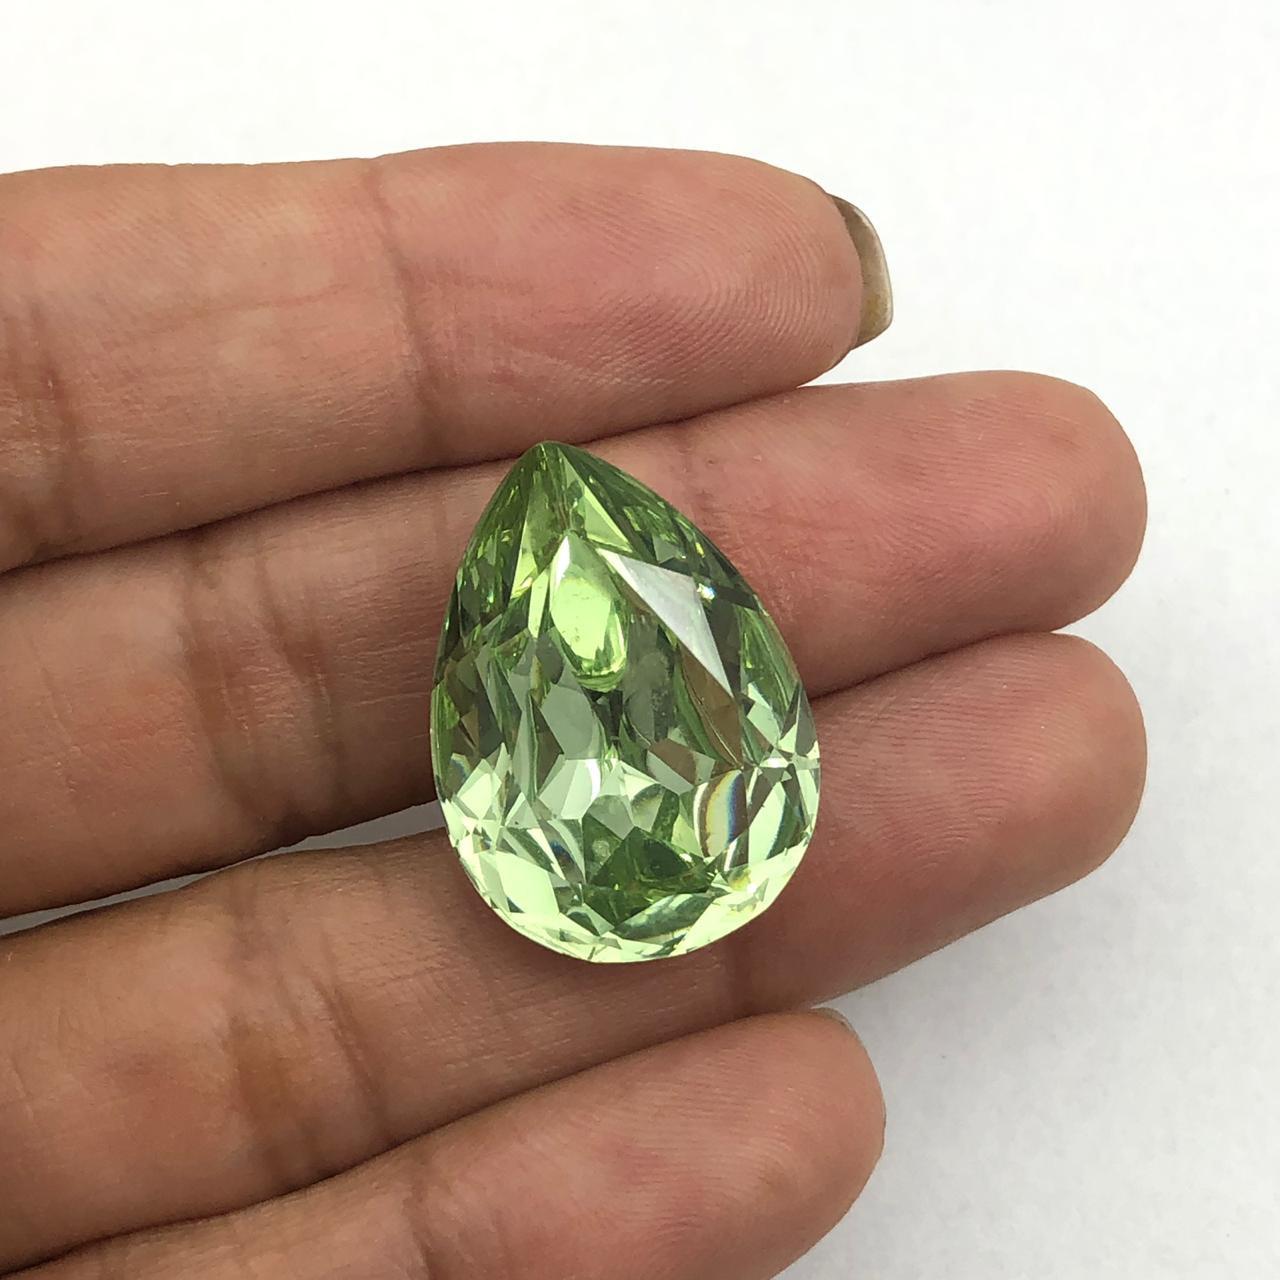 CHT1363 - Chaton Gota 18x25 Base Côncava Chrysolite - 2unids